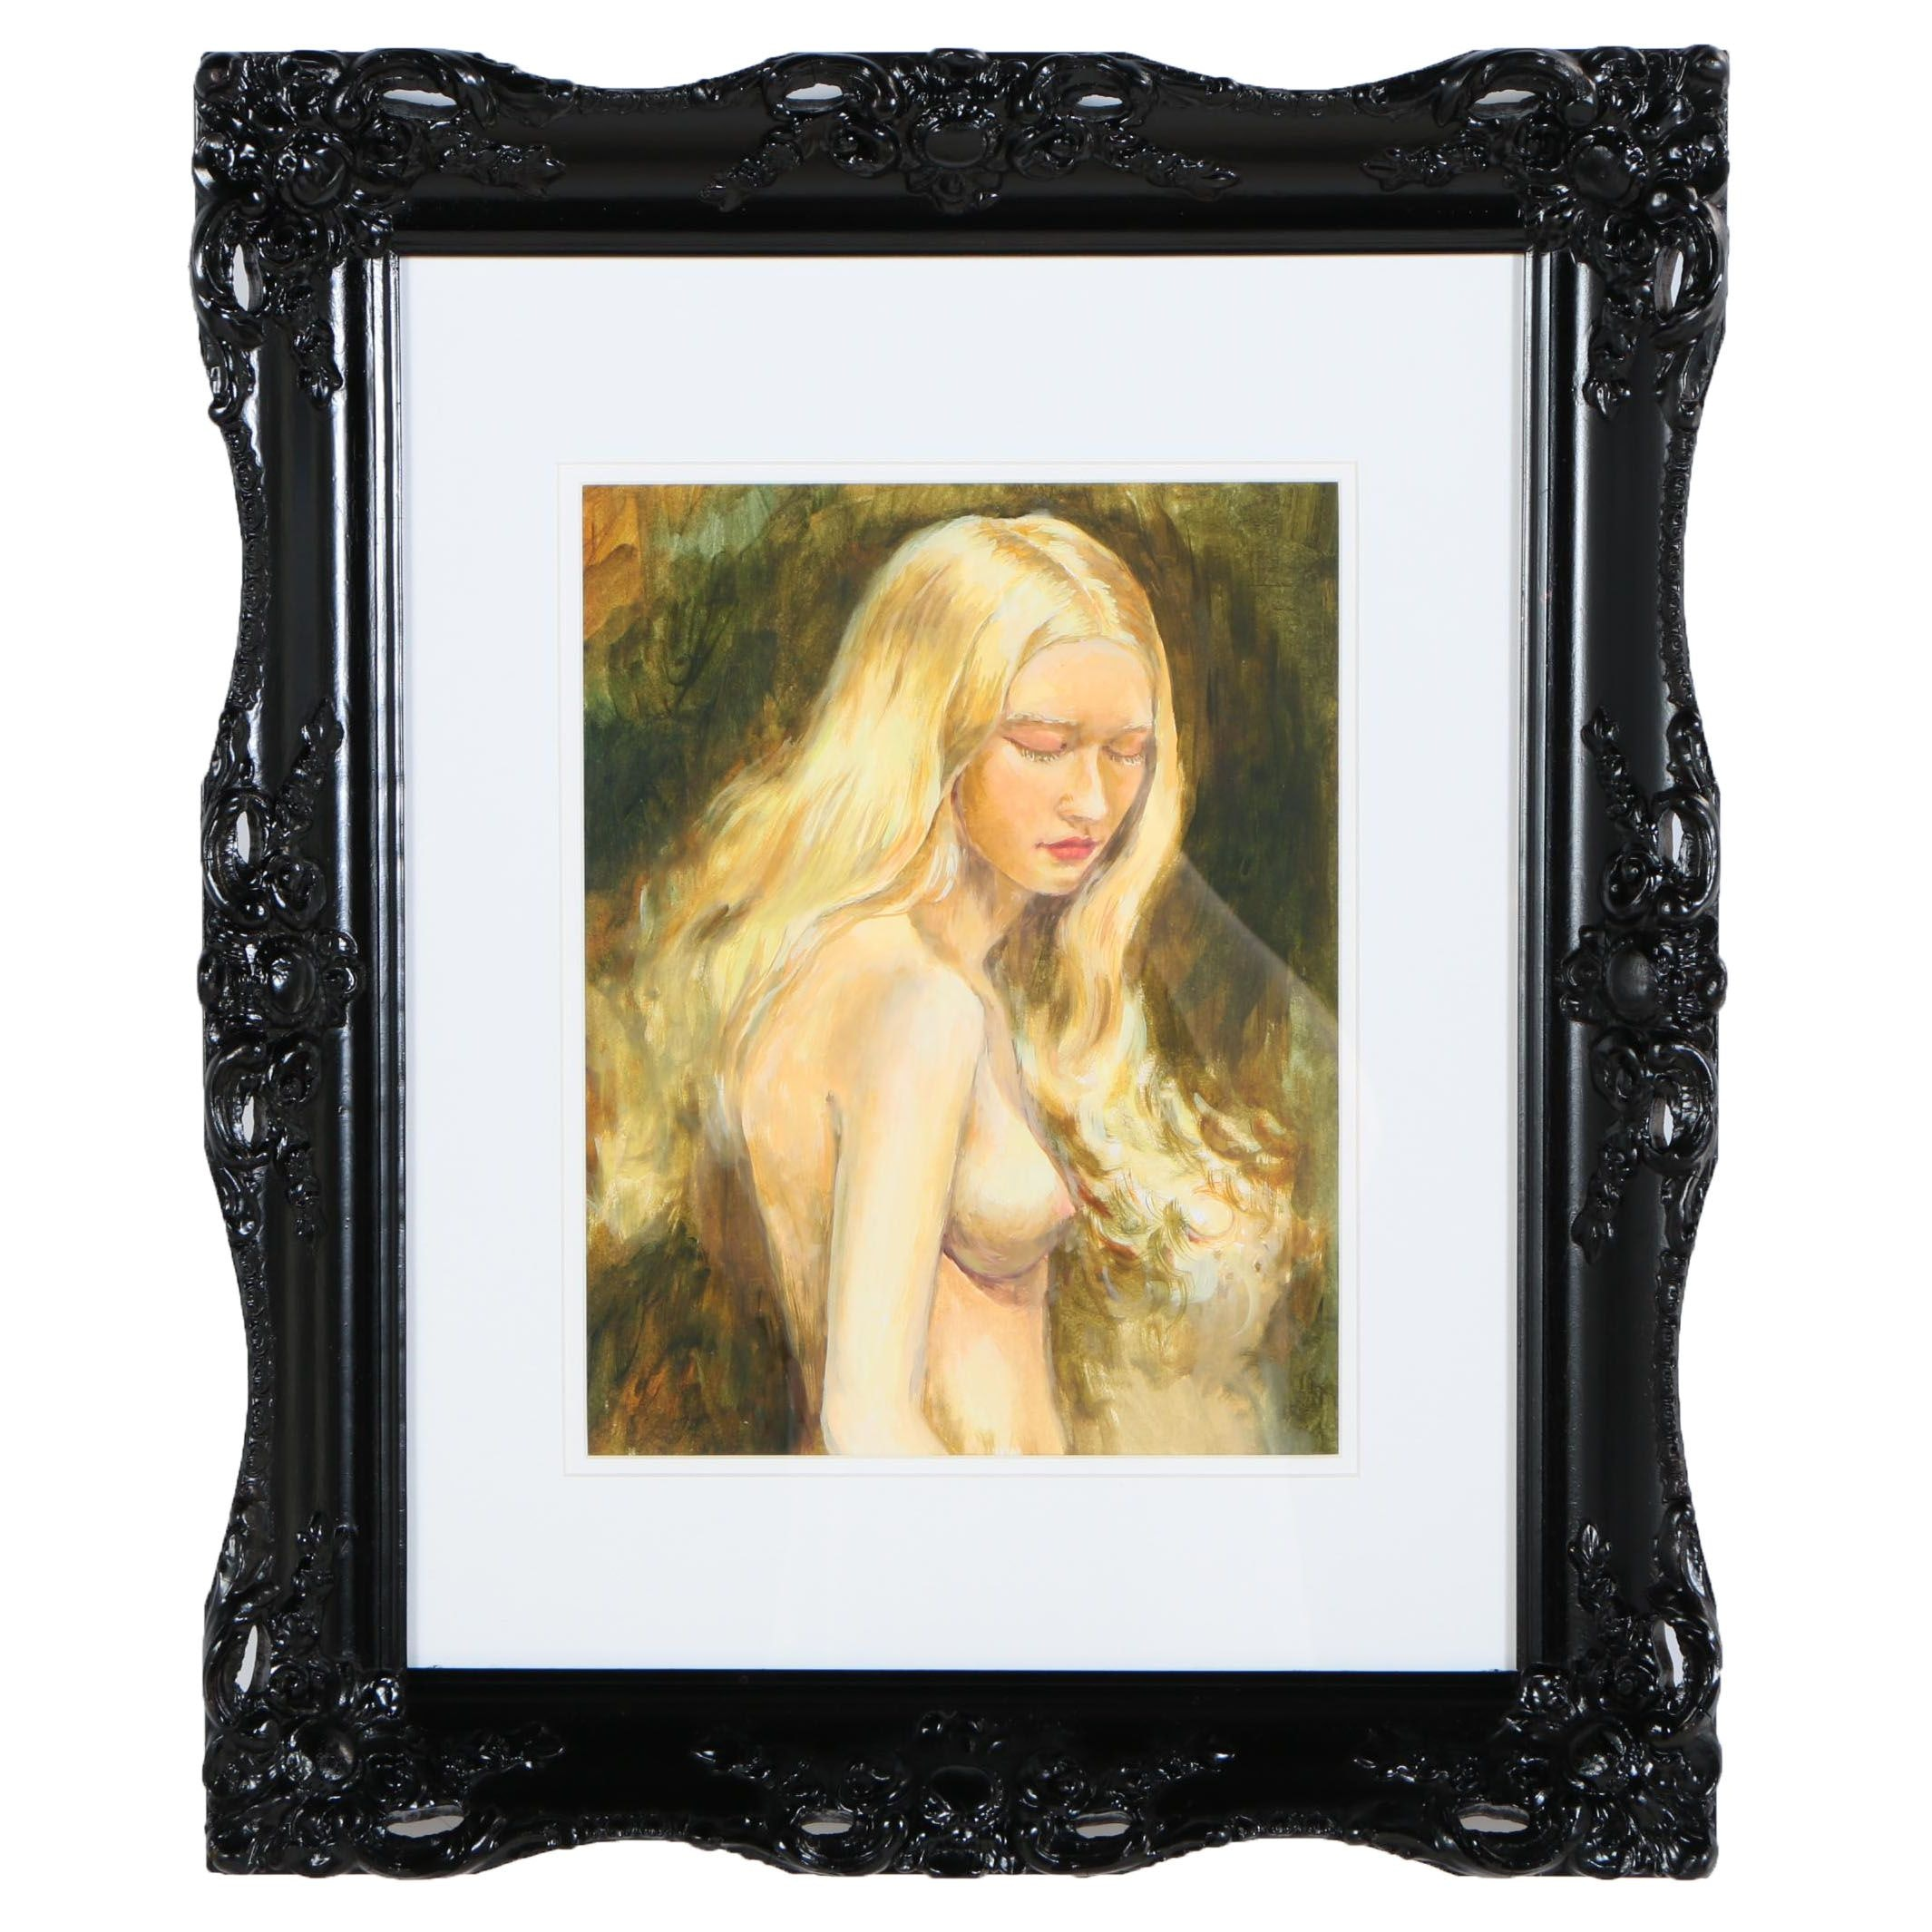 Oksana Belonozhko Oil Painting of Female Nude